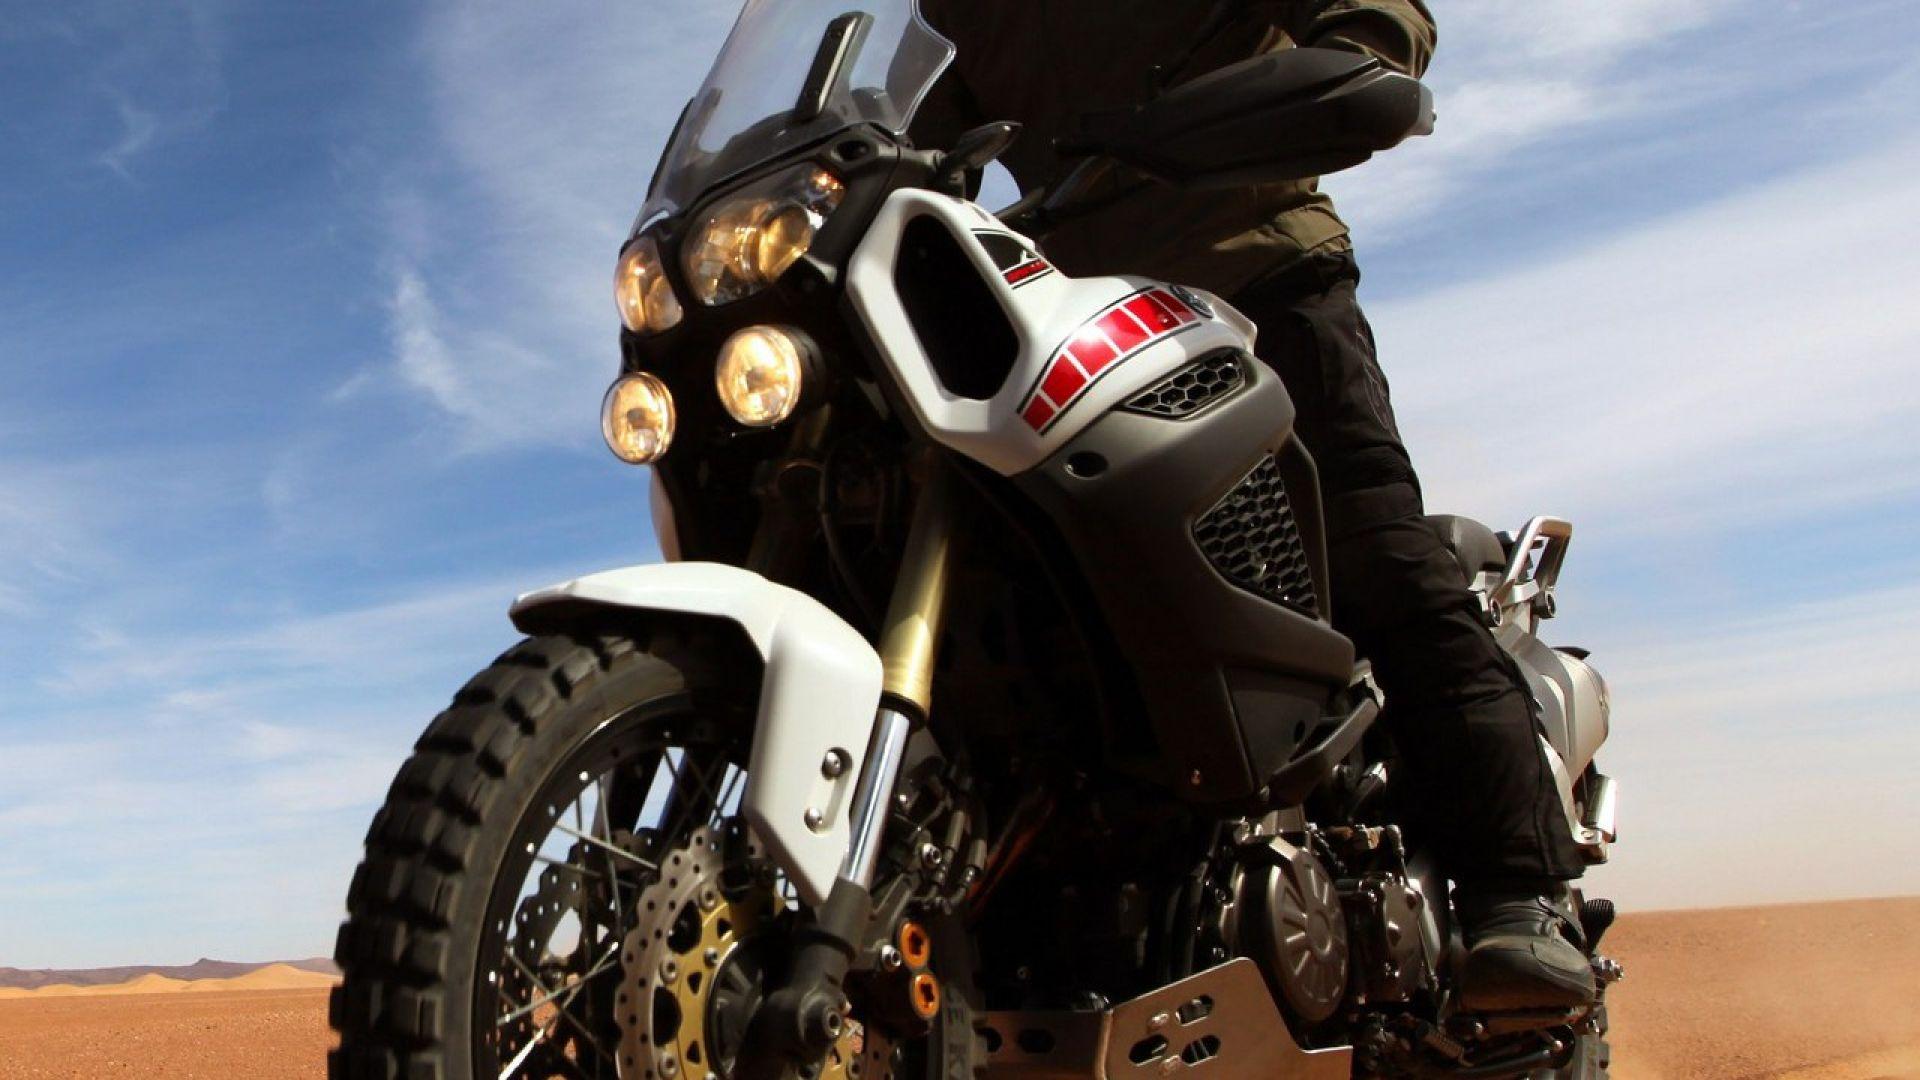 Immagine 103: In Marocco con la Yamaha Super Ténéré